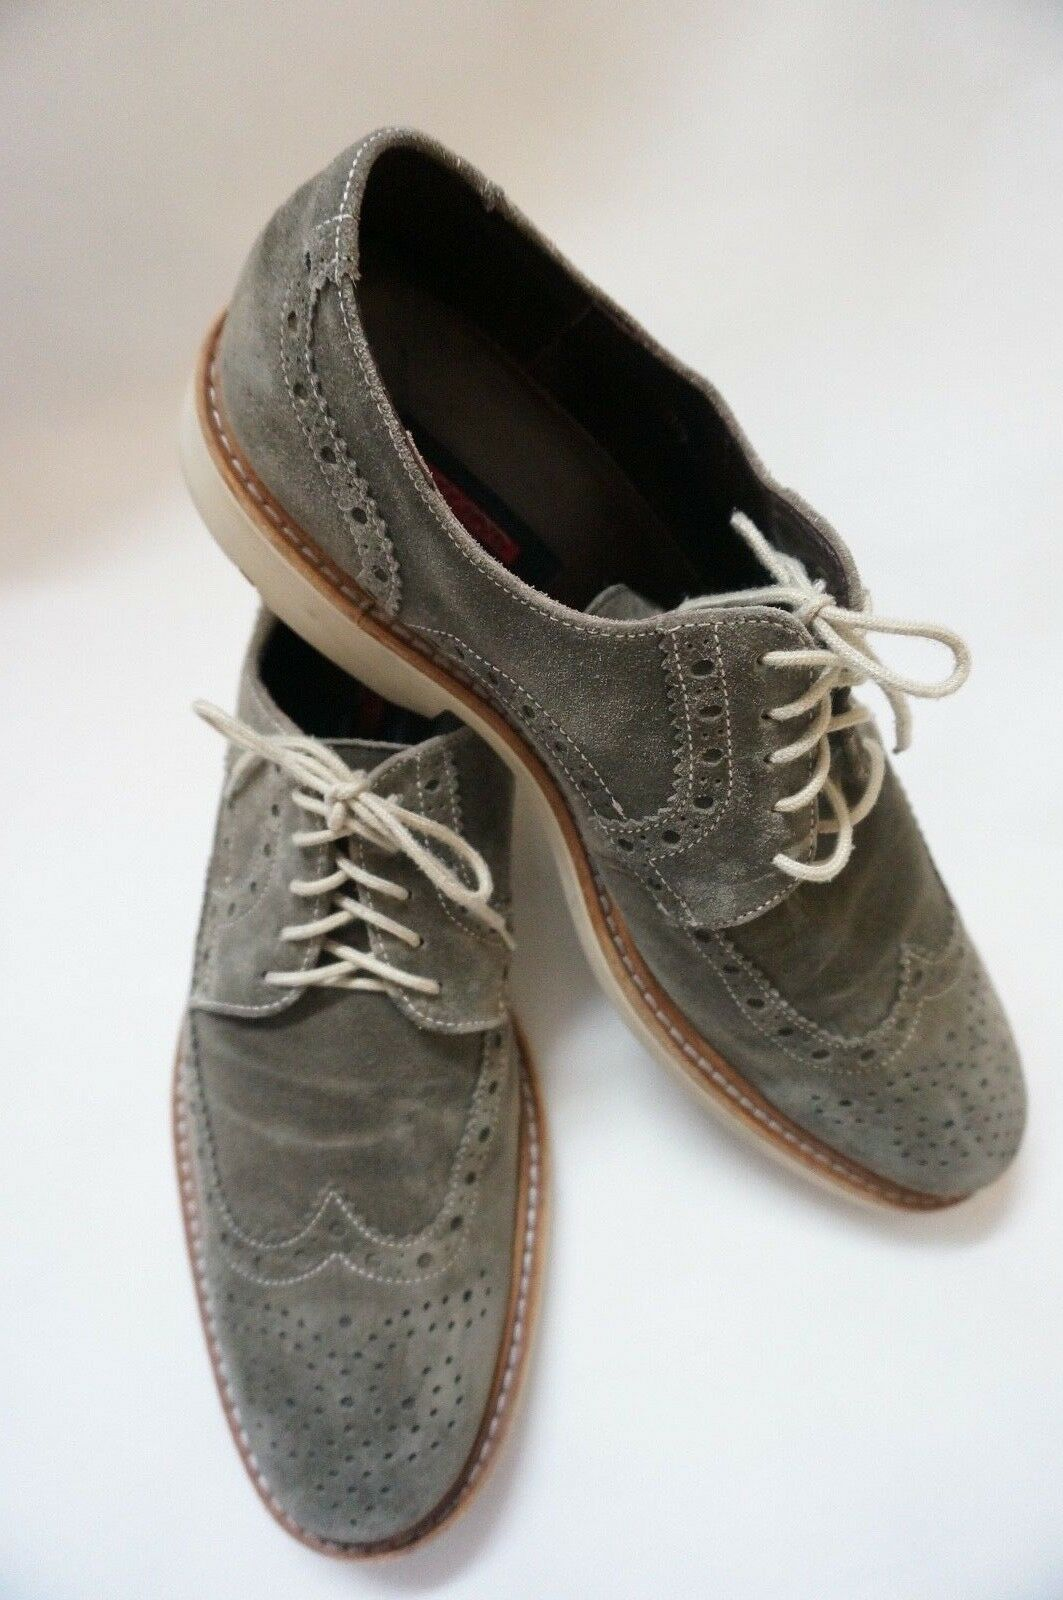 LLOYD Herren Schuhe Schnürschuhe Grau Größe : 44,5 / 10,5